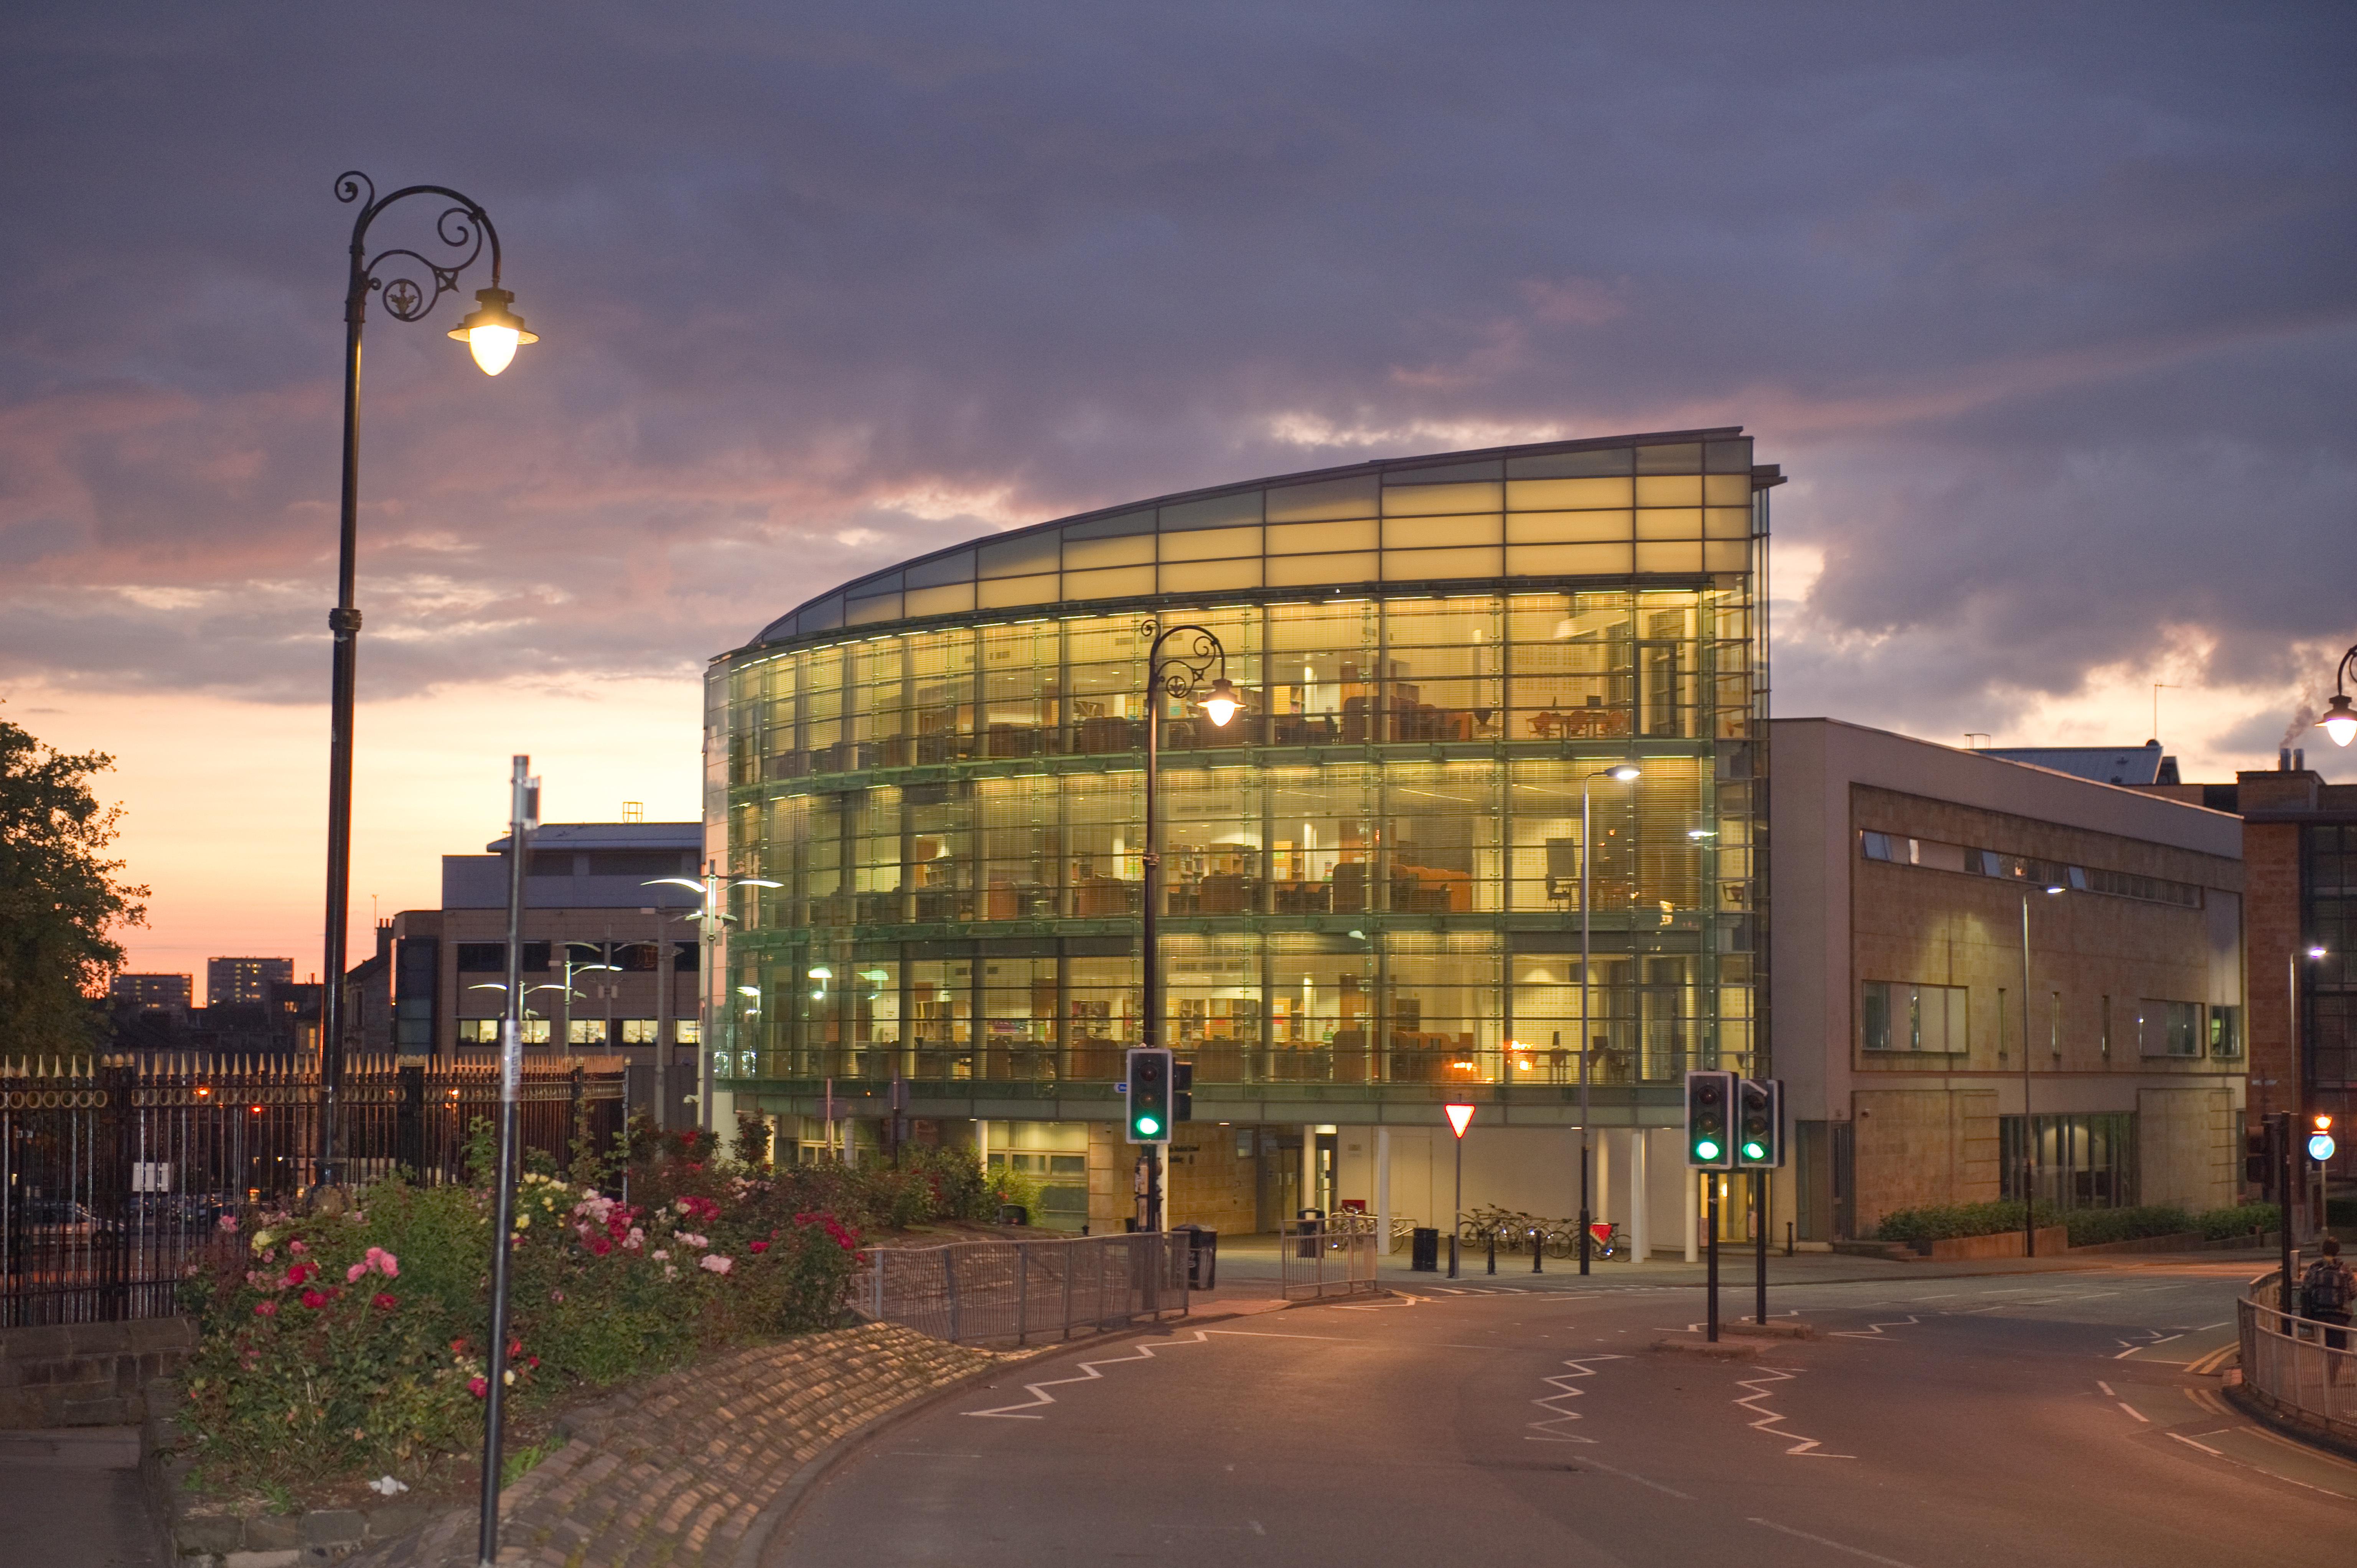 University of Glasgow Medical School building at night